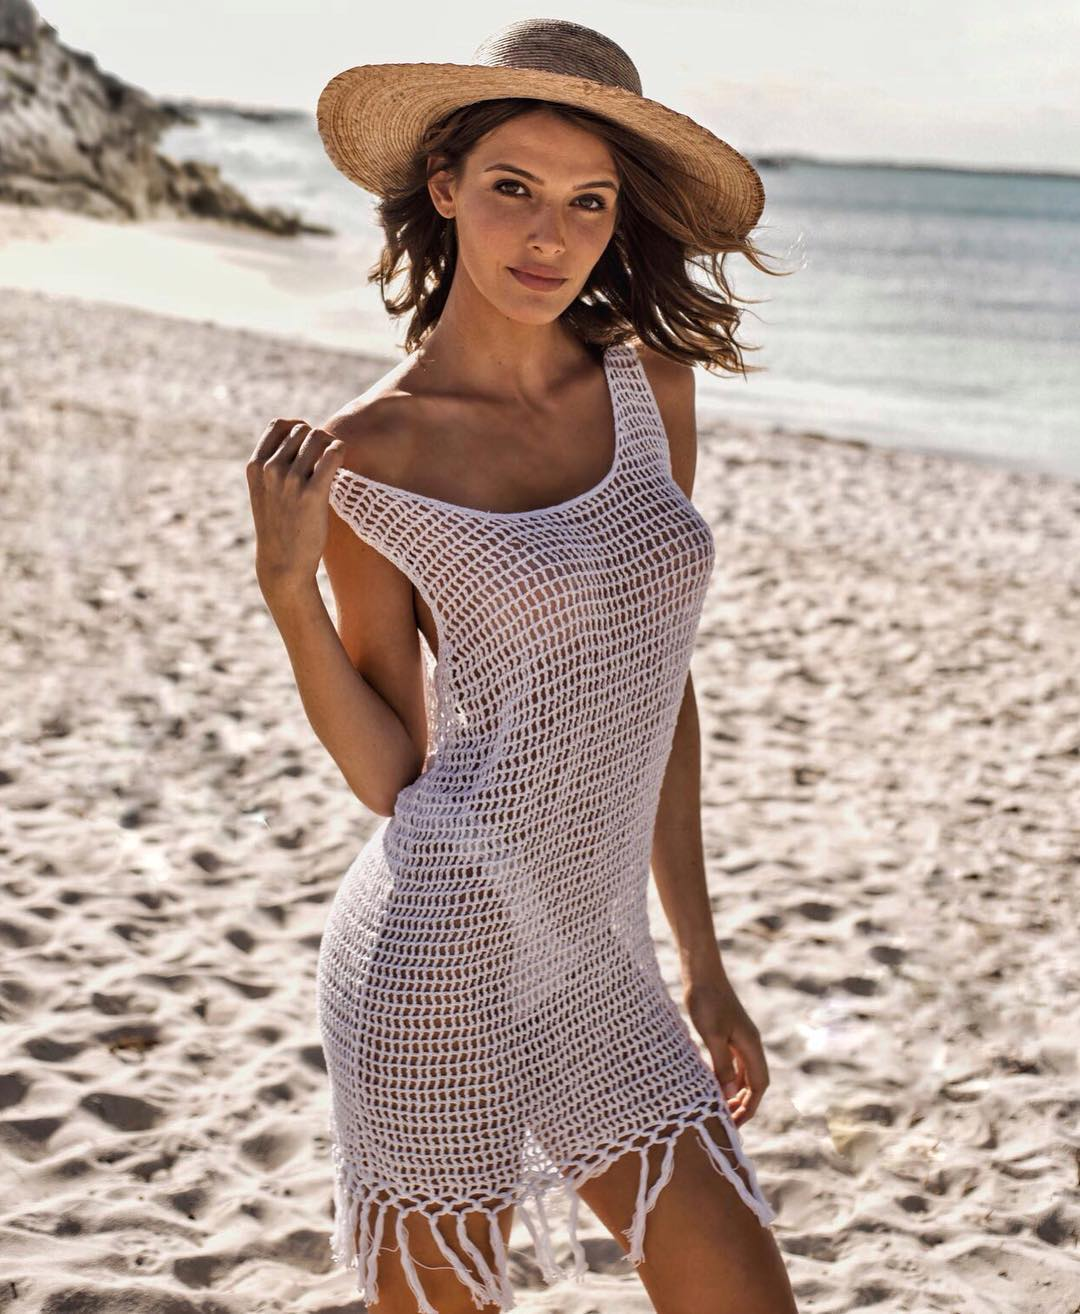 60f6b609d Saída de praia de crochê: 50 modelos delicados e versáteis